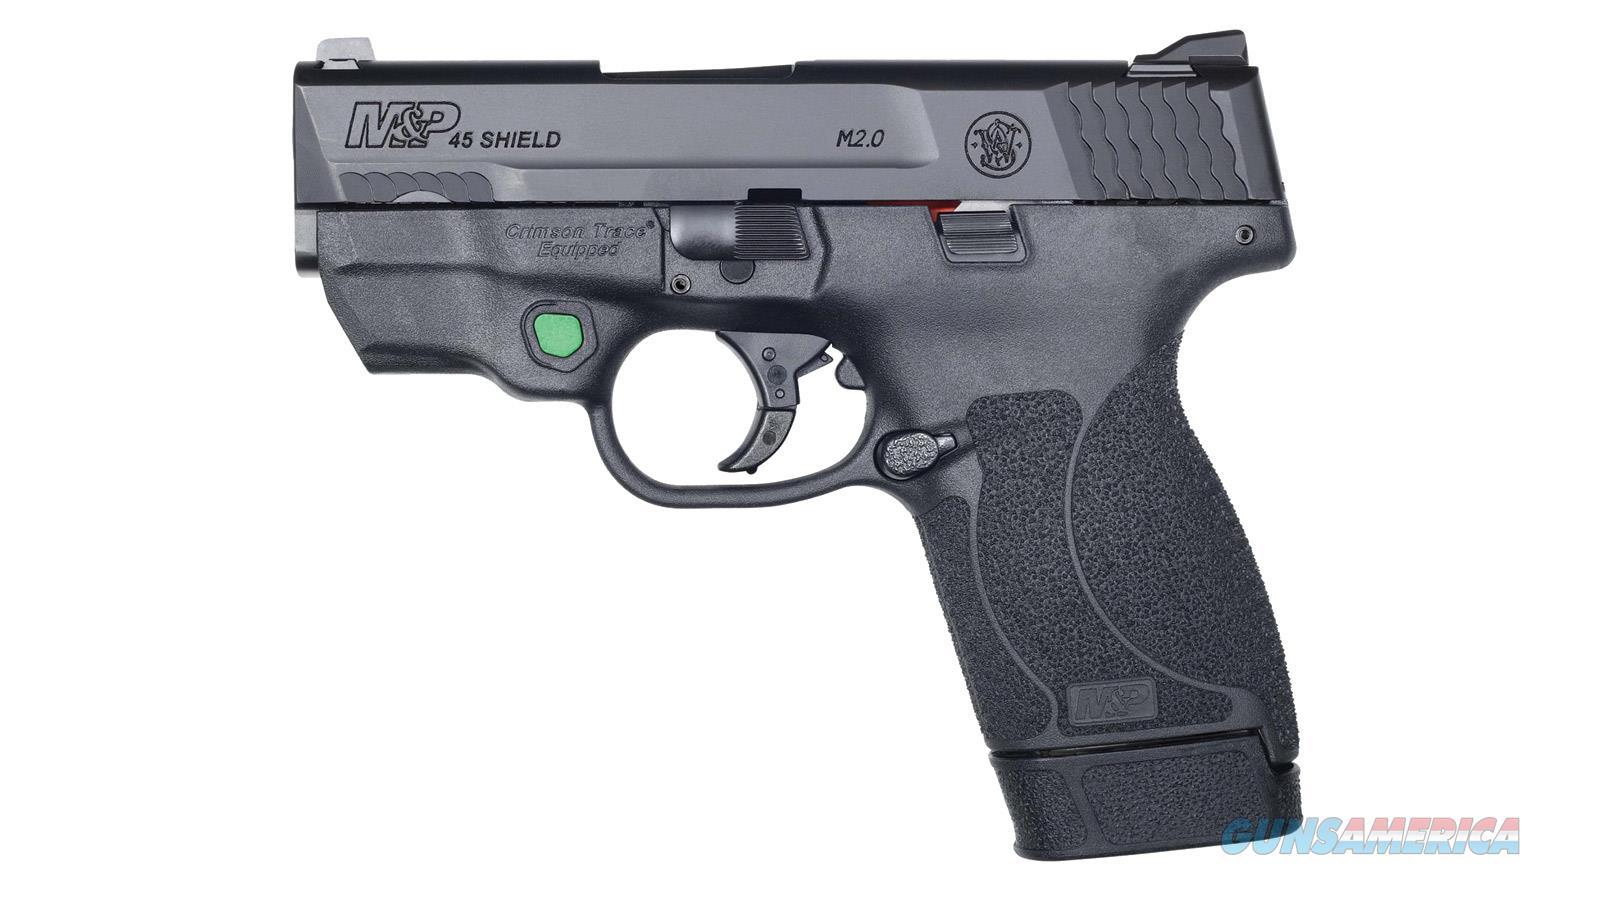 Smith & Wesson M&P45 Shield M2.0 45Acp Ct Green Laser Nts 12090  Guns > Pistols > S Misc Pistols